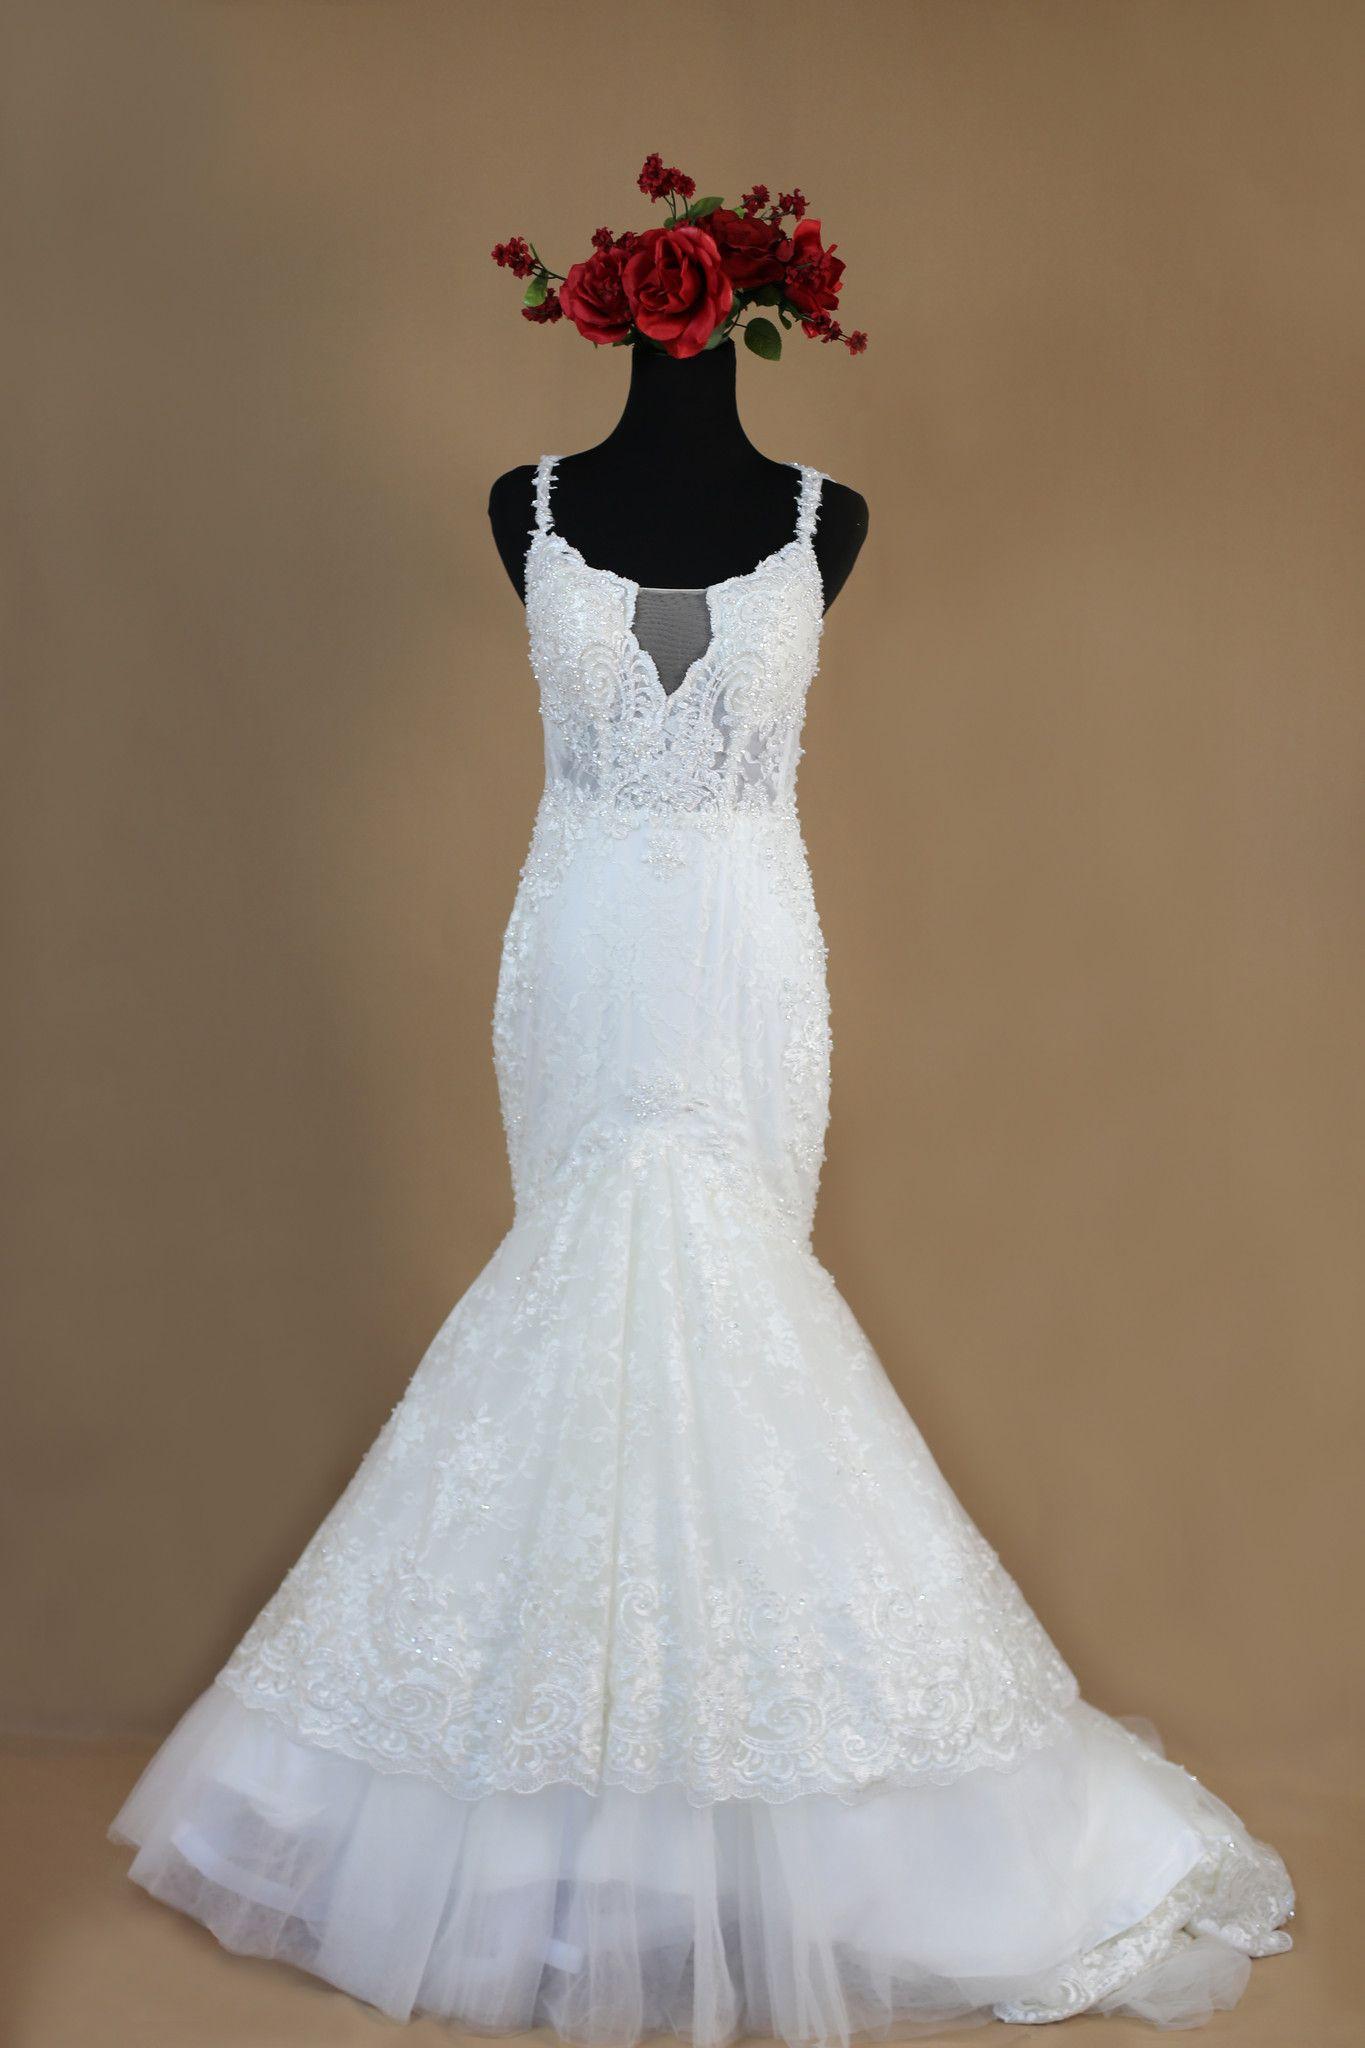 Lace trumpet wedding dress style pb dream dress trumpets